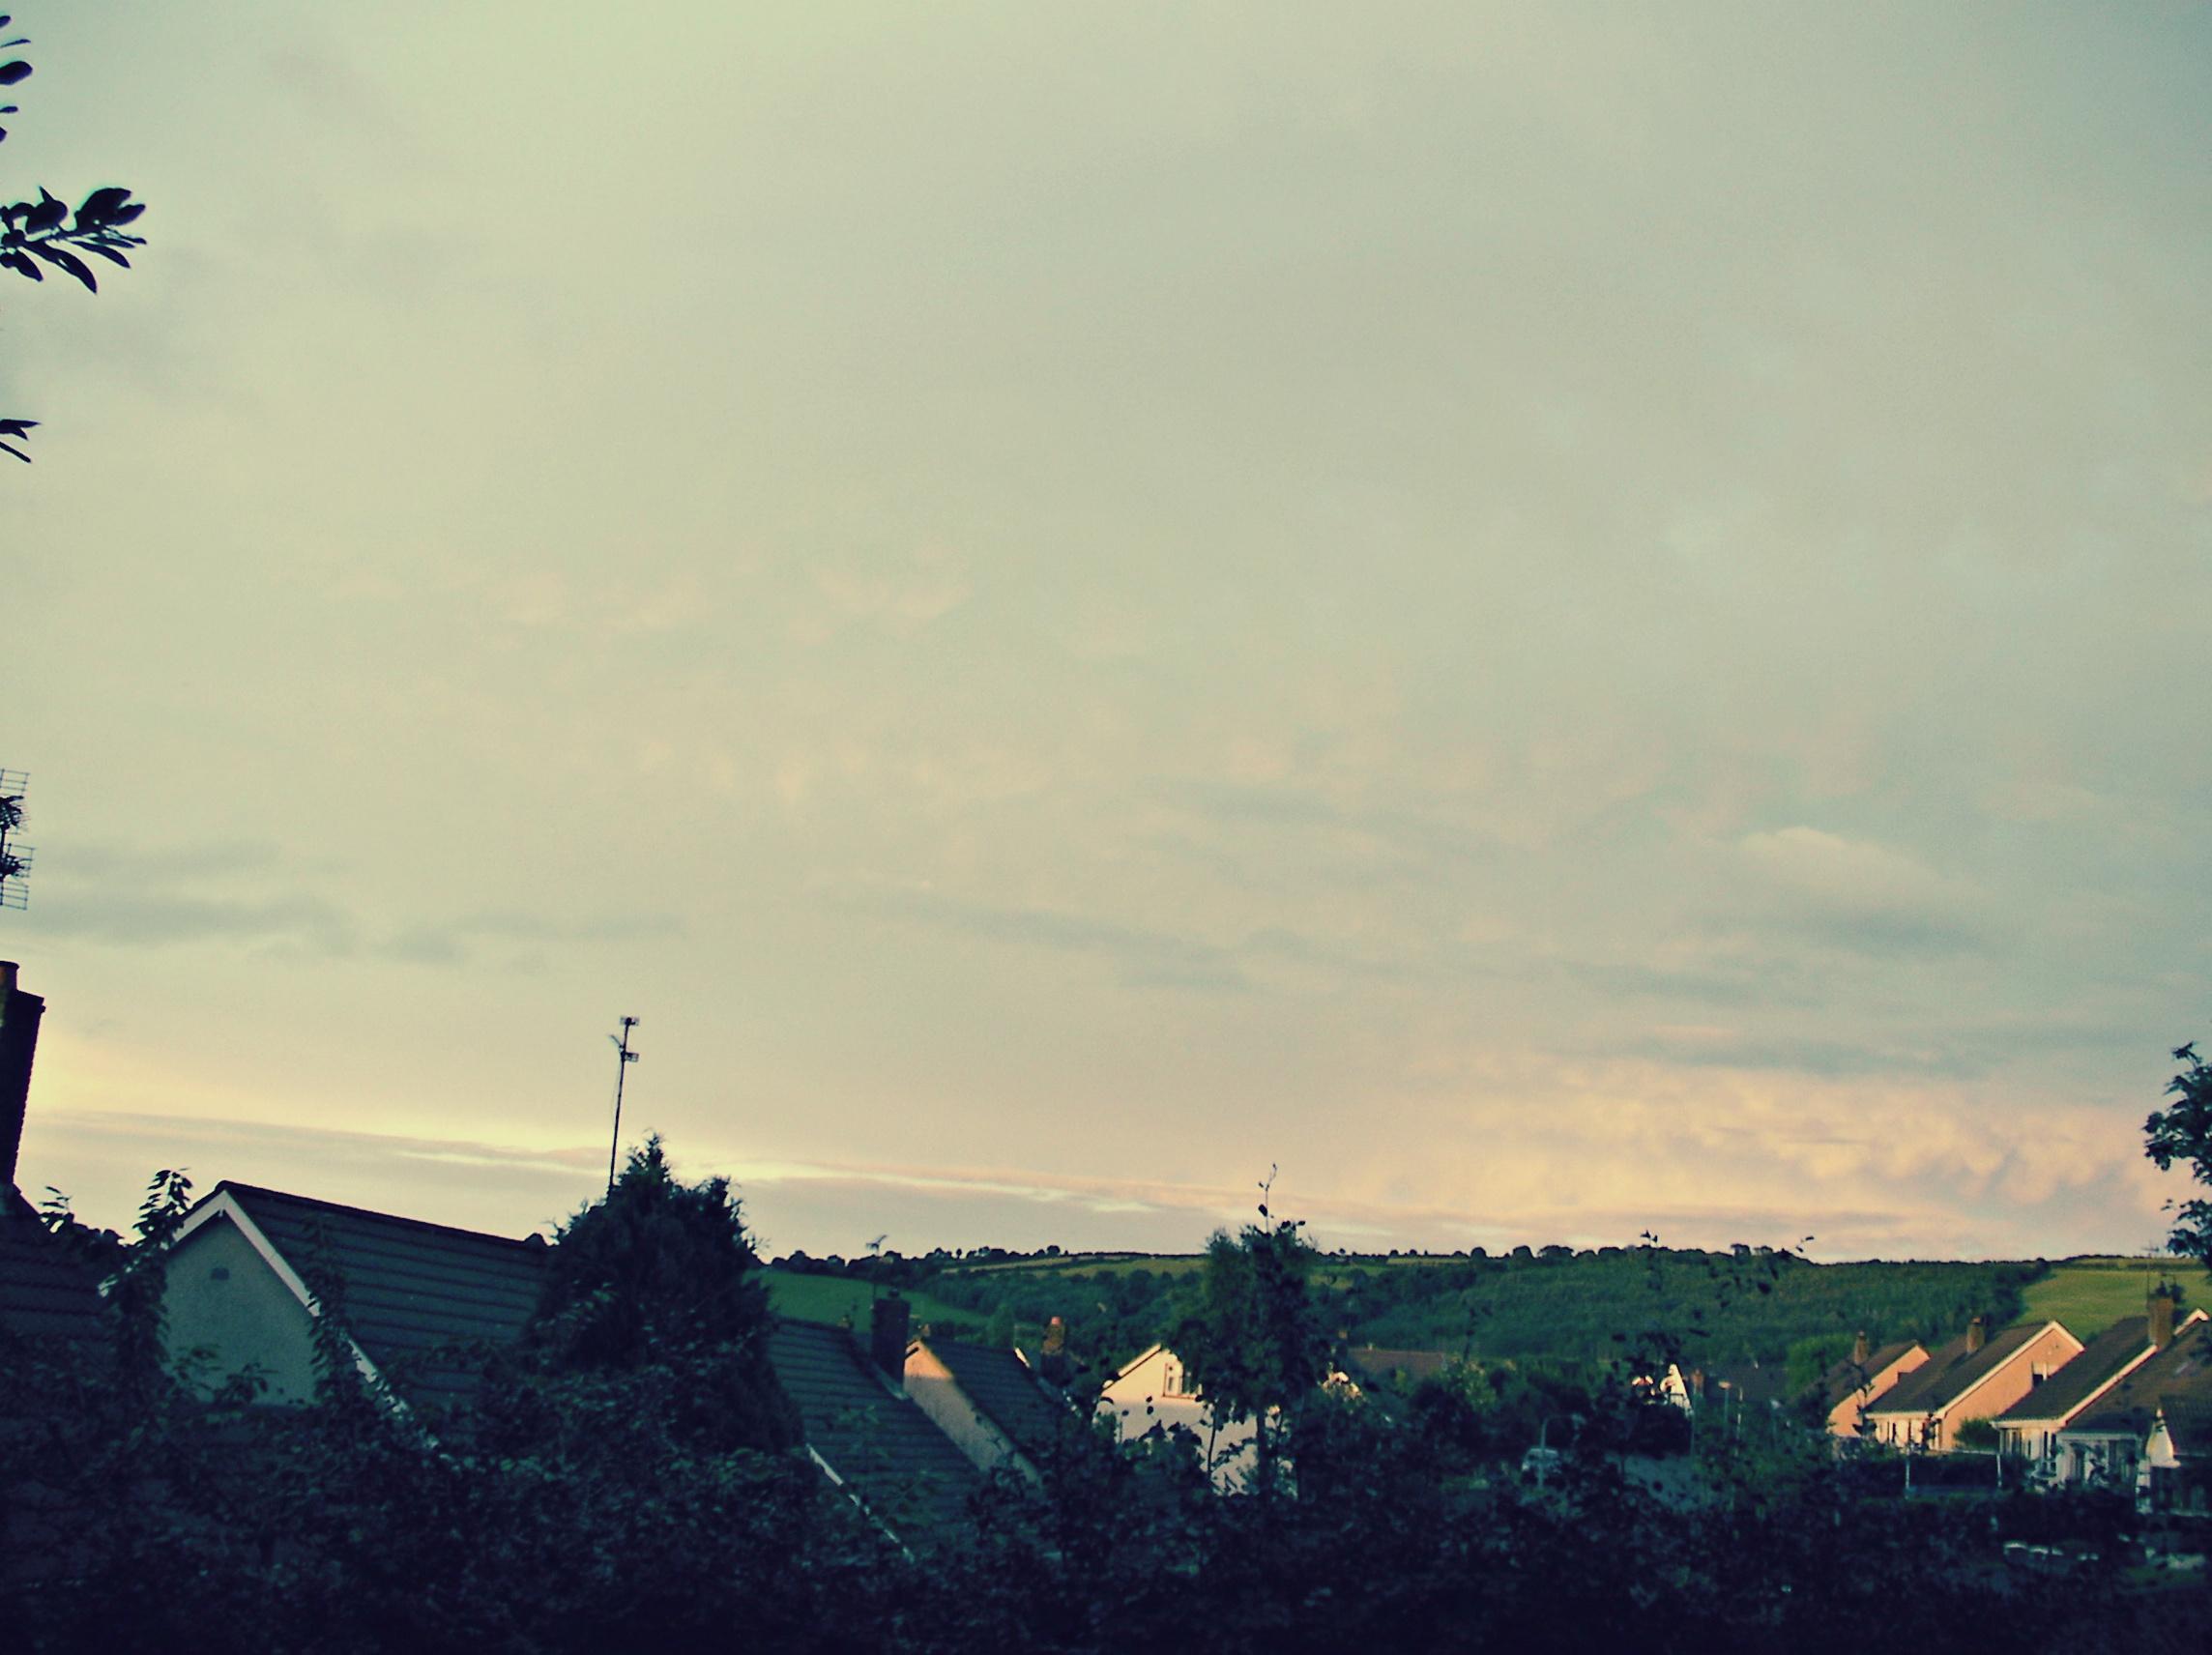 View from my bedroom window in Ireland